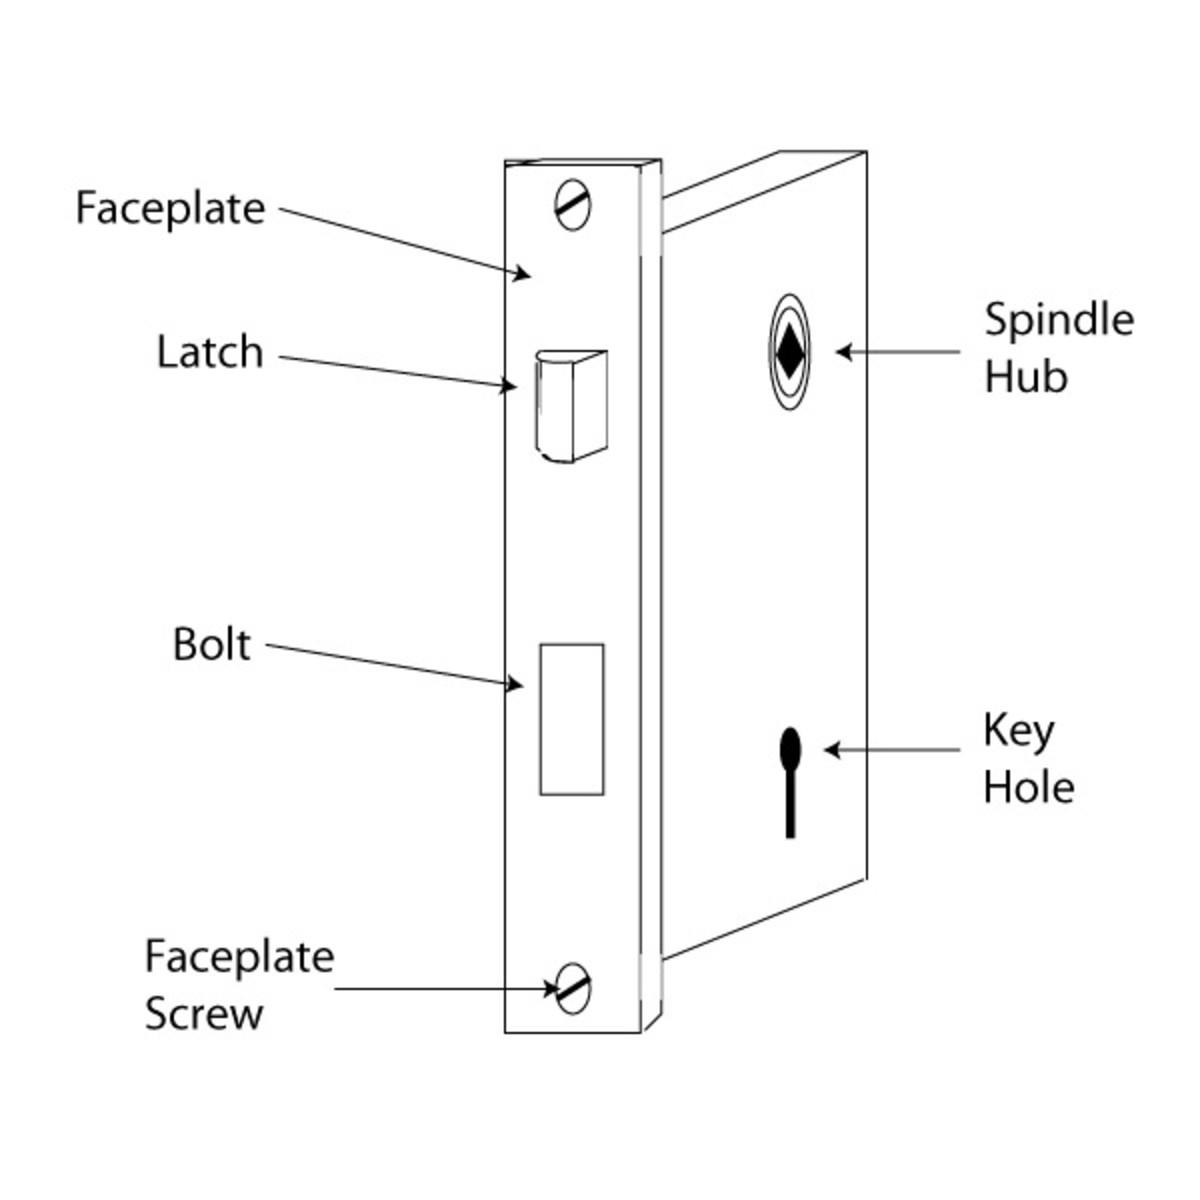 External anatomy of the bit key lock.